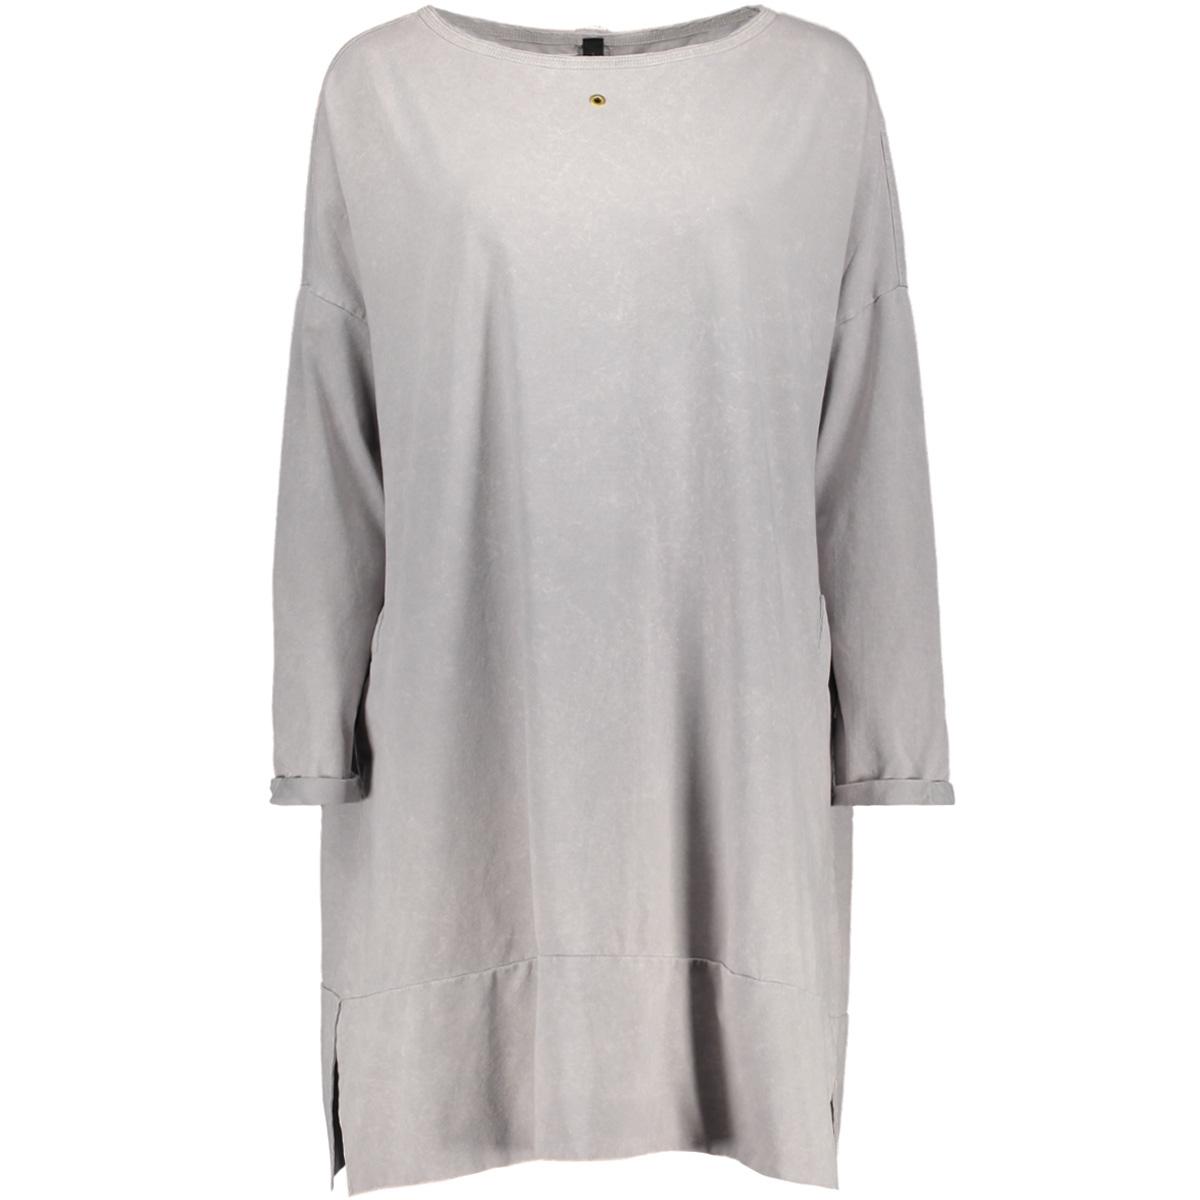 20-331-7103 10 days jurk soft grey